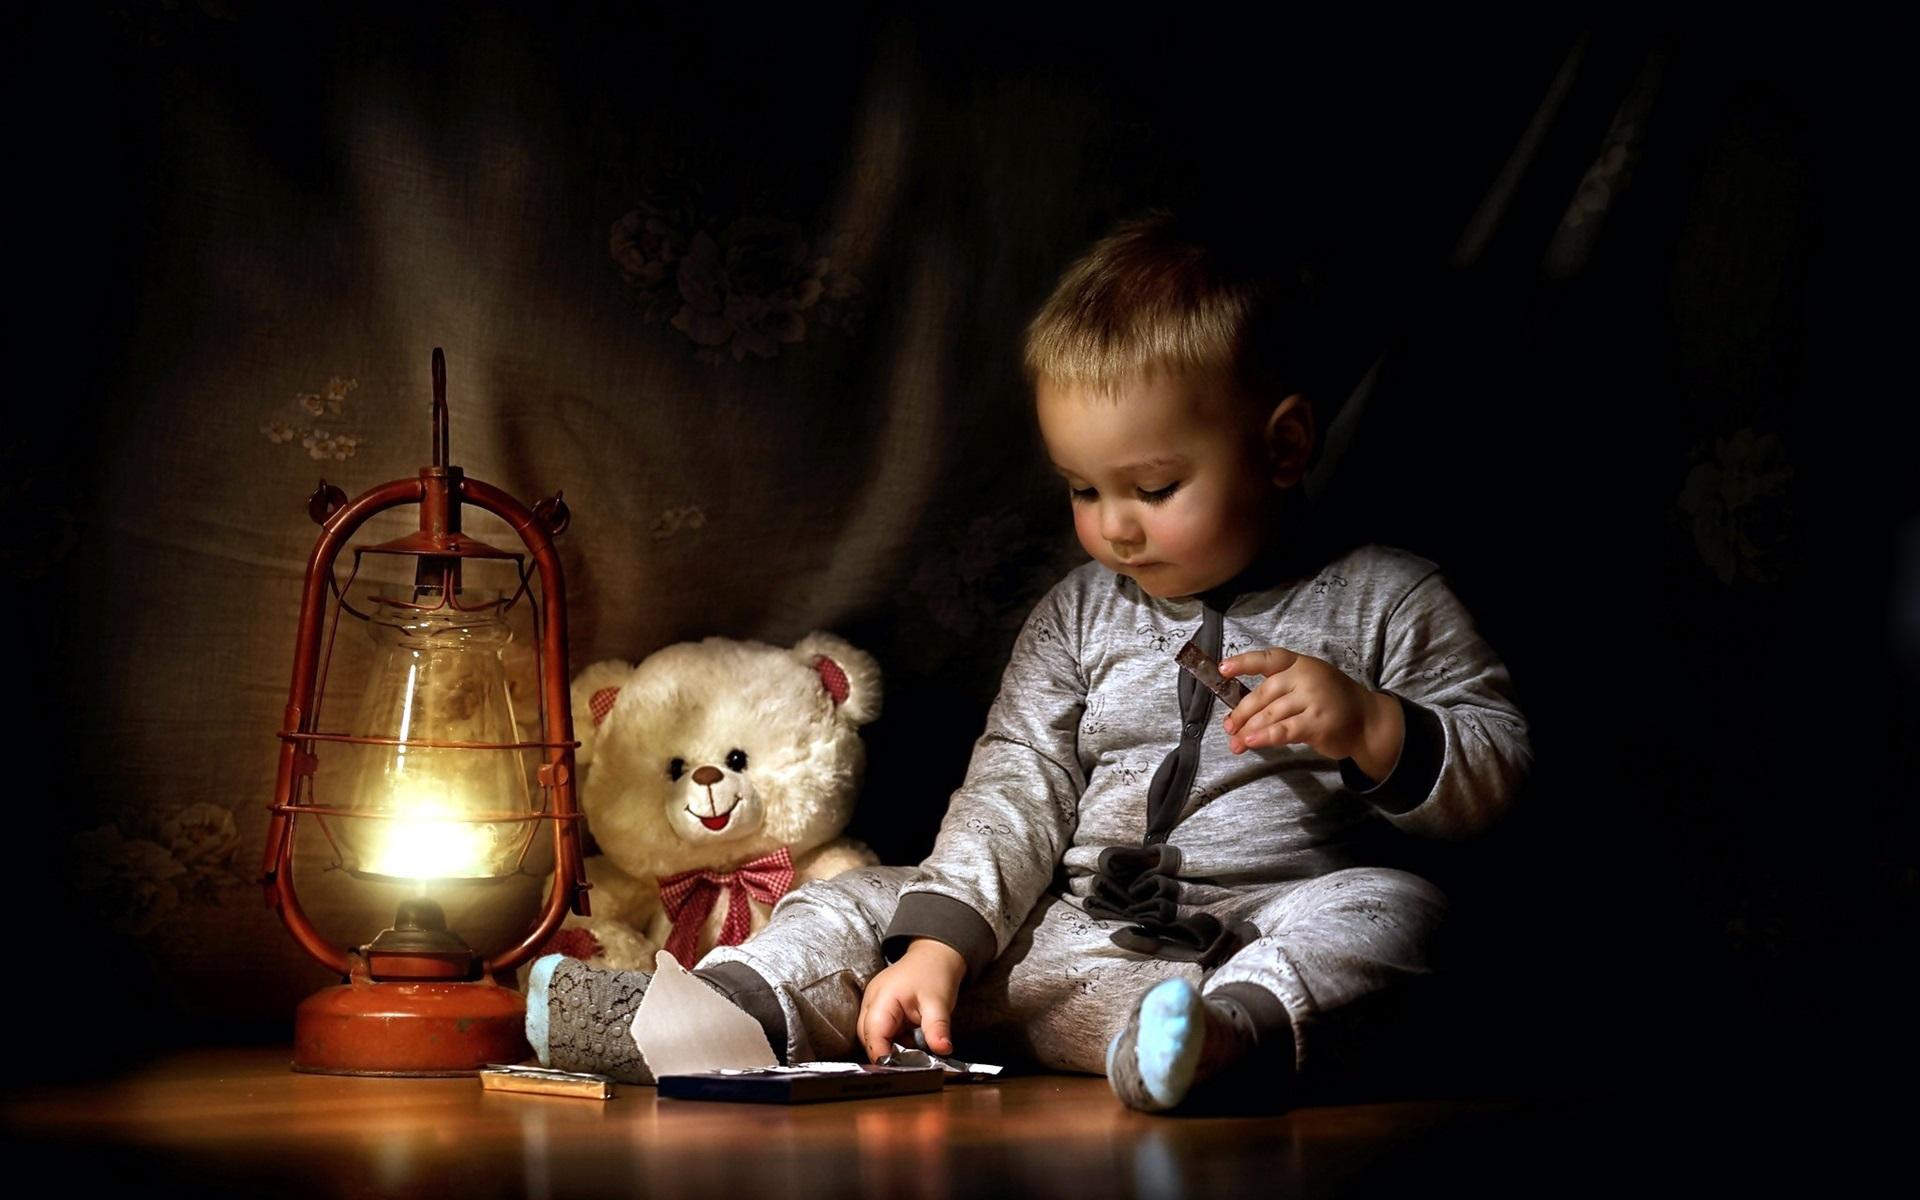 Wallpaper Cute Little Boy Eat Chocolate Teddy Lamp